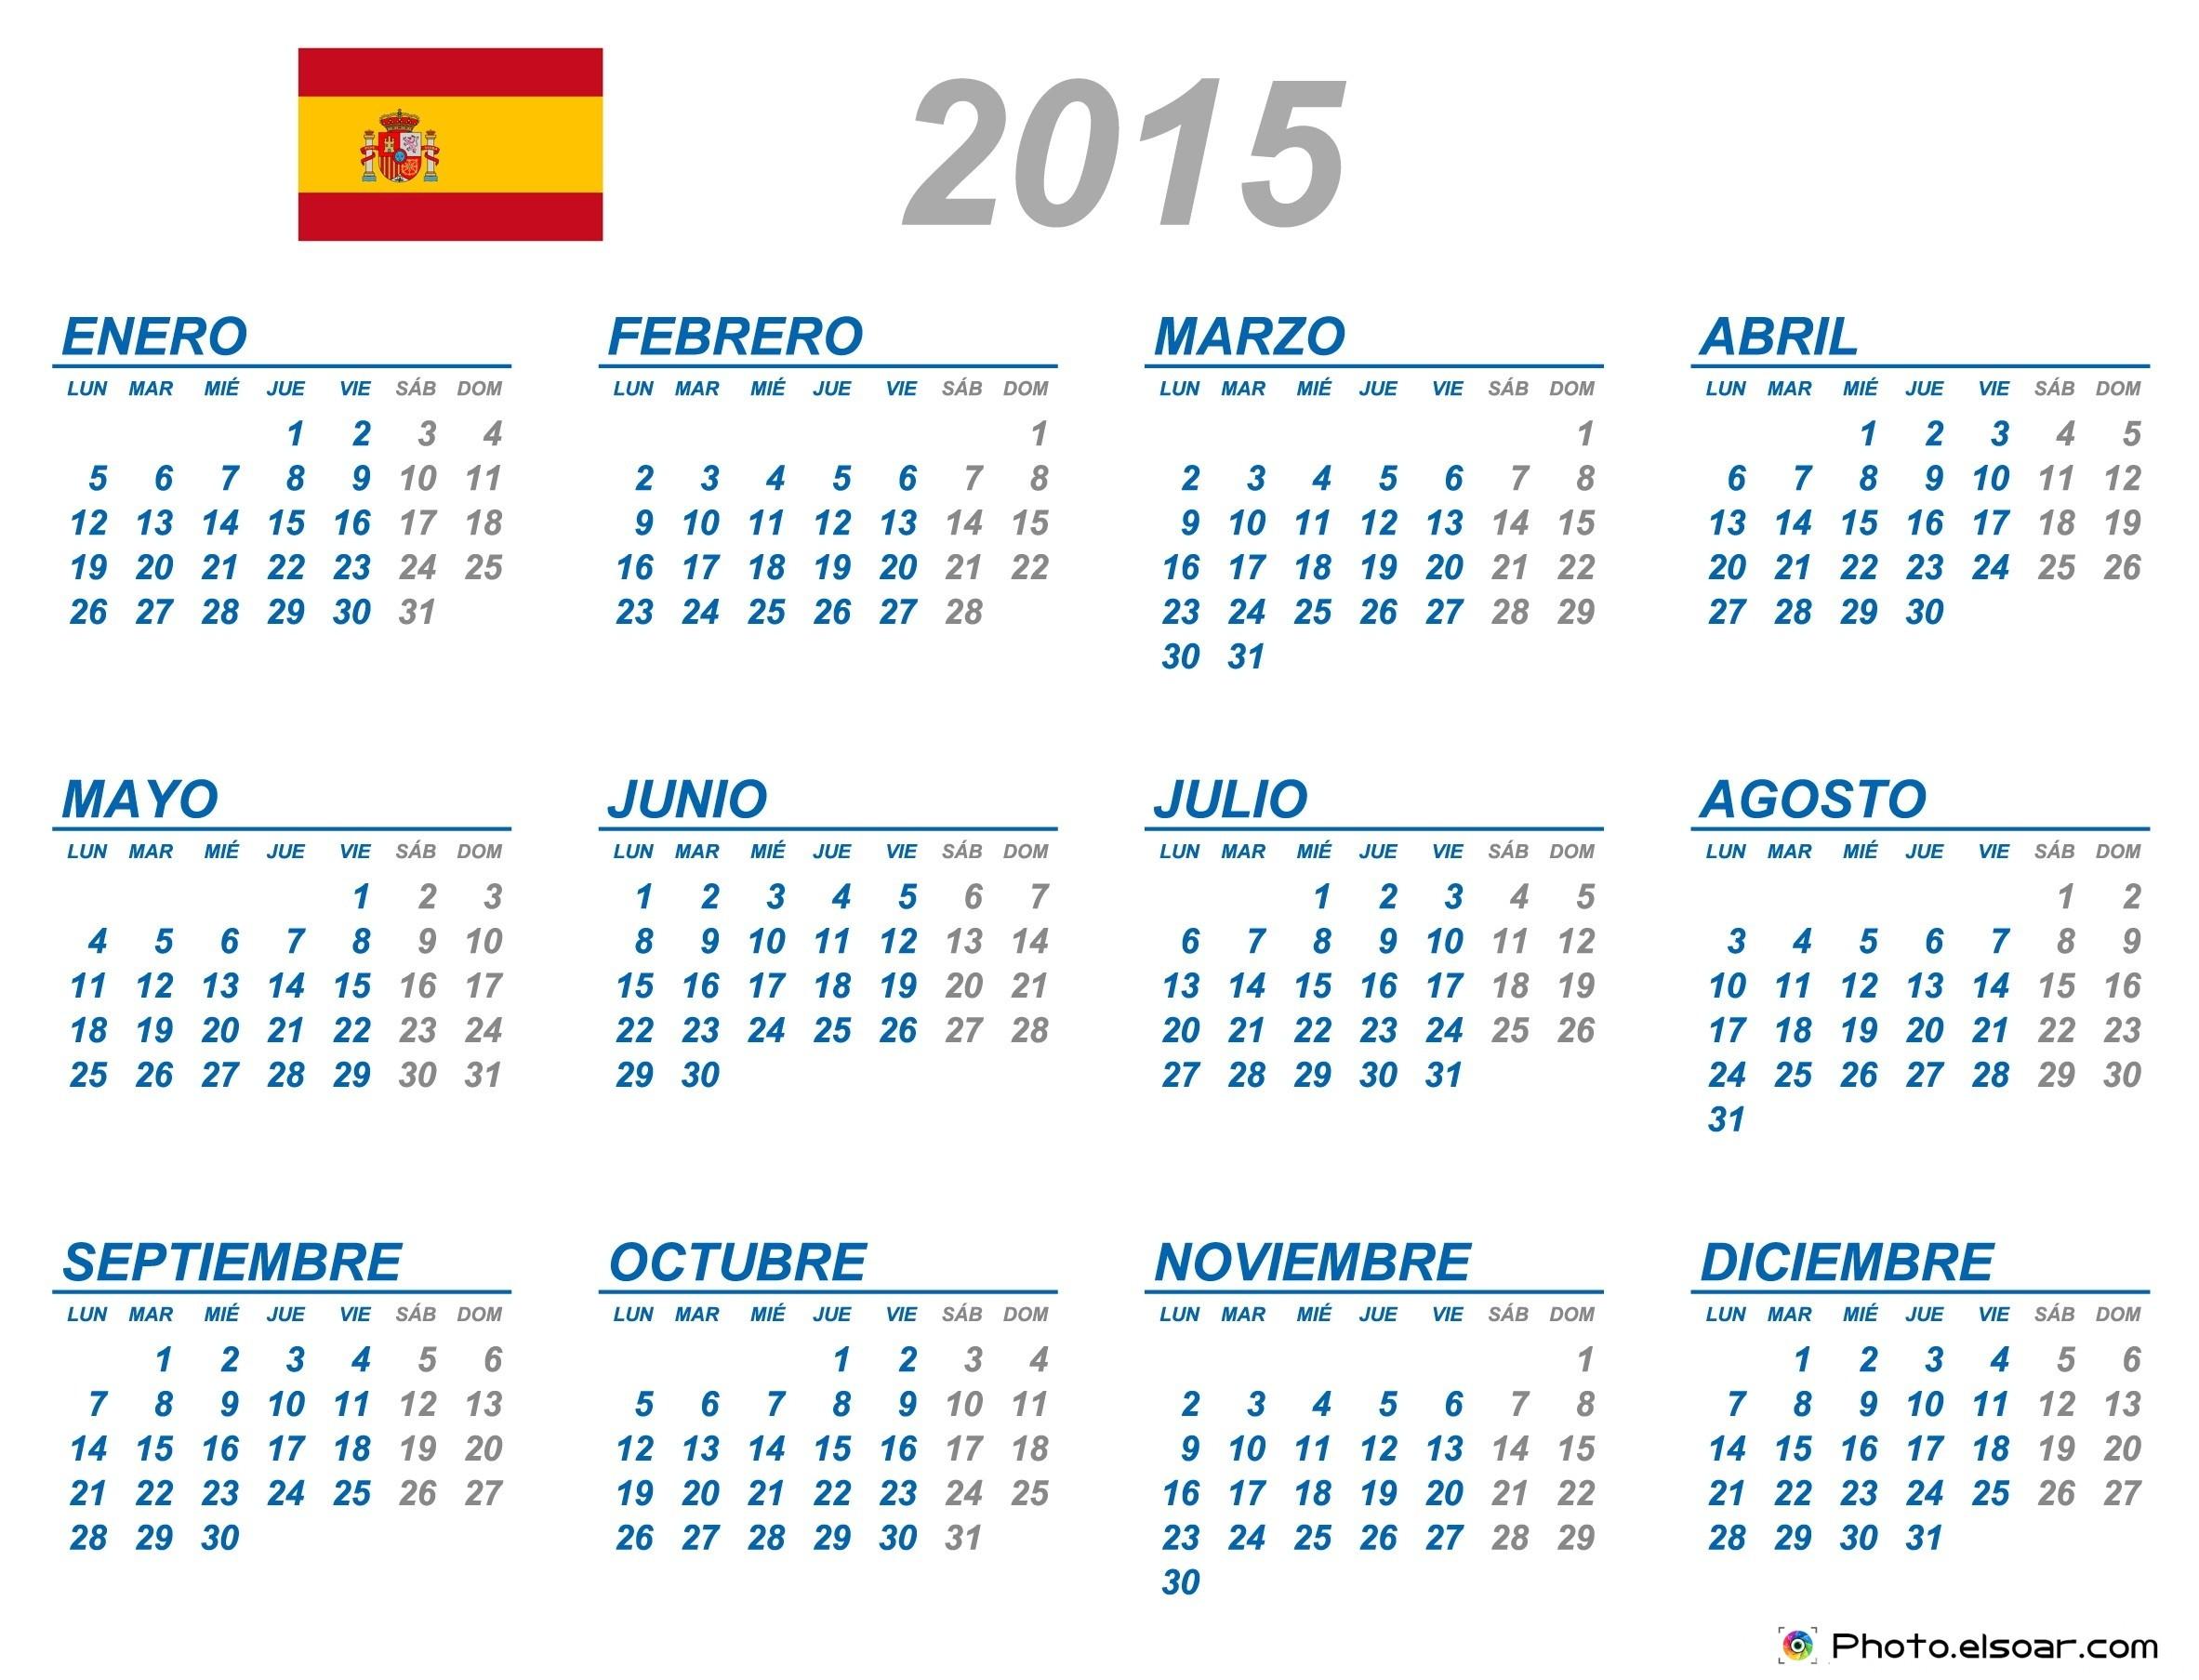 Calendario Octubre 2019 Para Imprimir Bonito Recientes Imprimir Calendario Elegant Imprimir Calendario Stunning